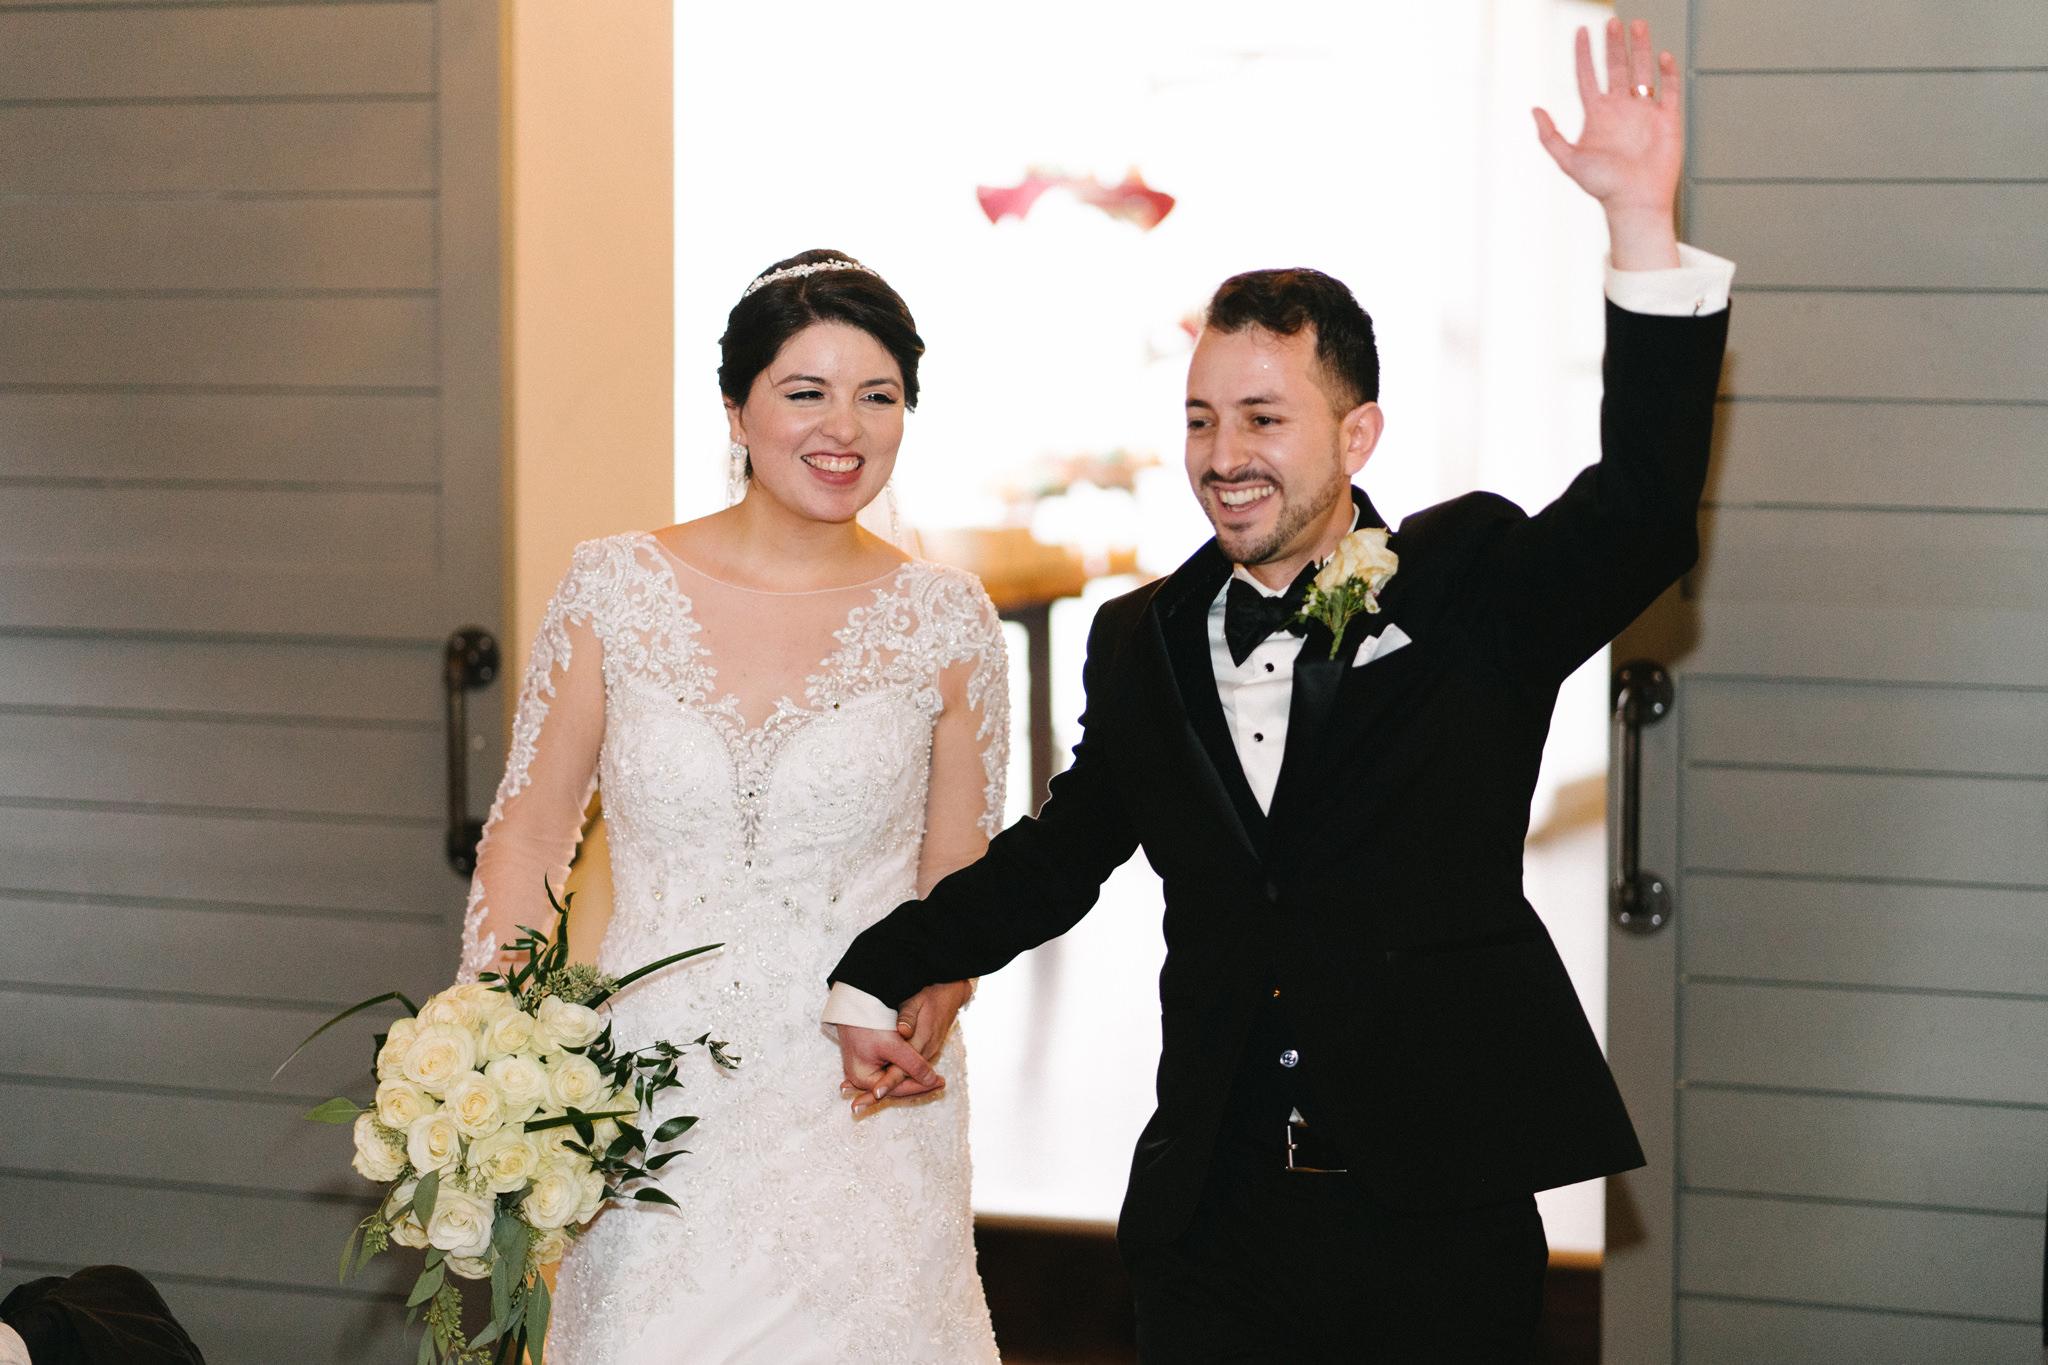 040-rempel-photography-chicago-wedding-inspiration-susan-daniel-michigan-metro-detroit-christian-church-holly-vault-cupcakes-and-kisses.jpg